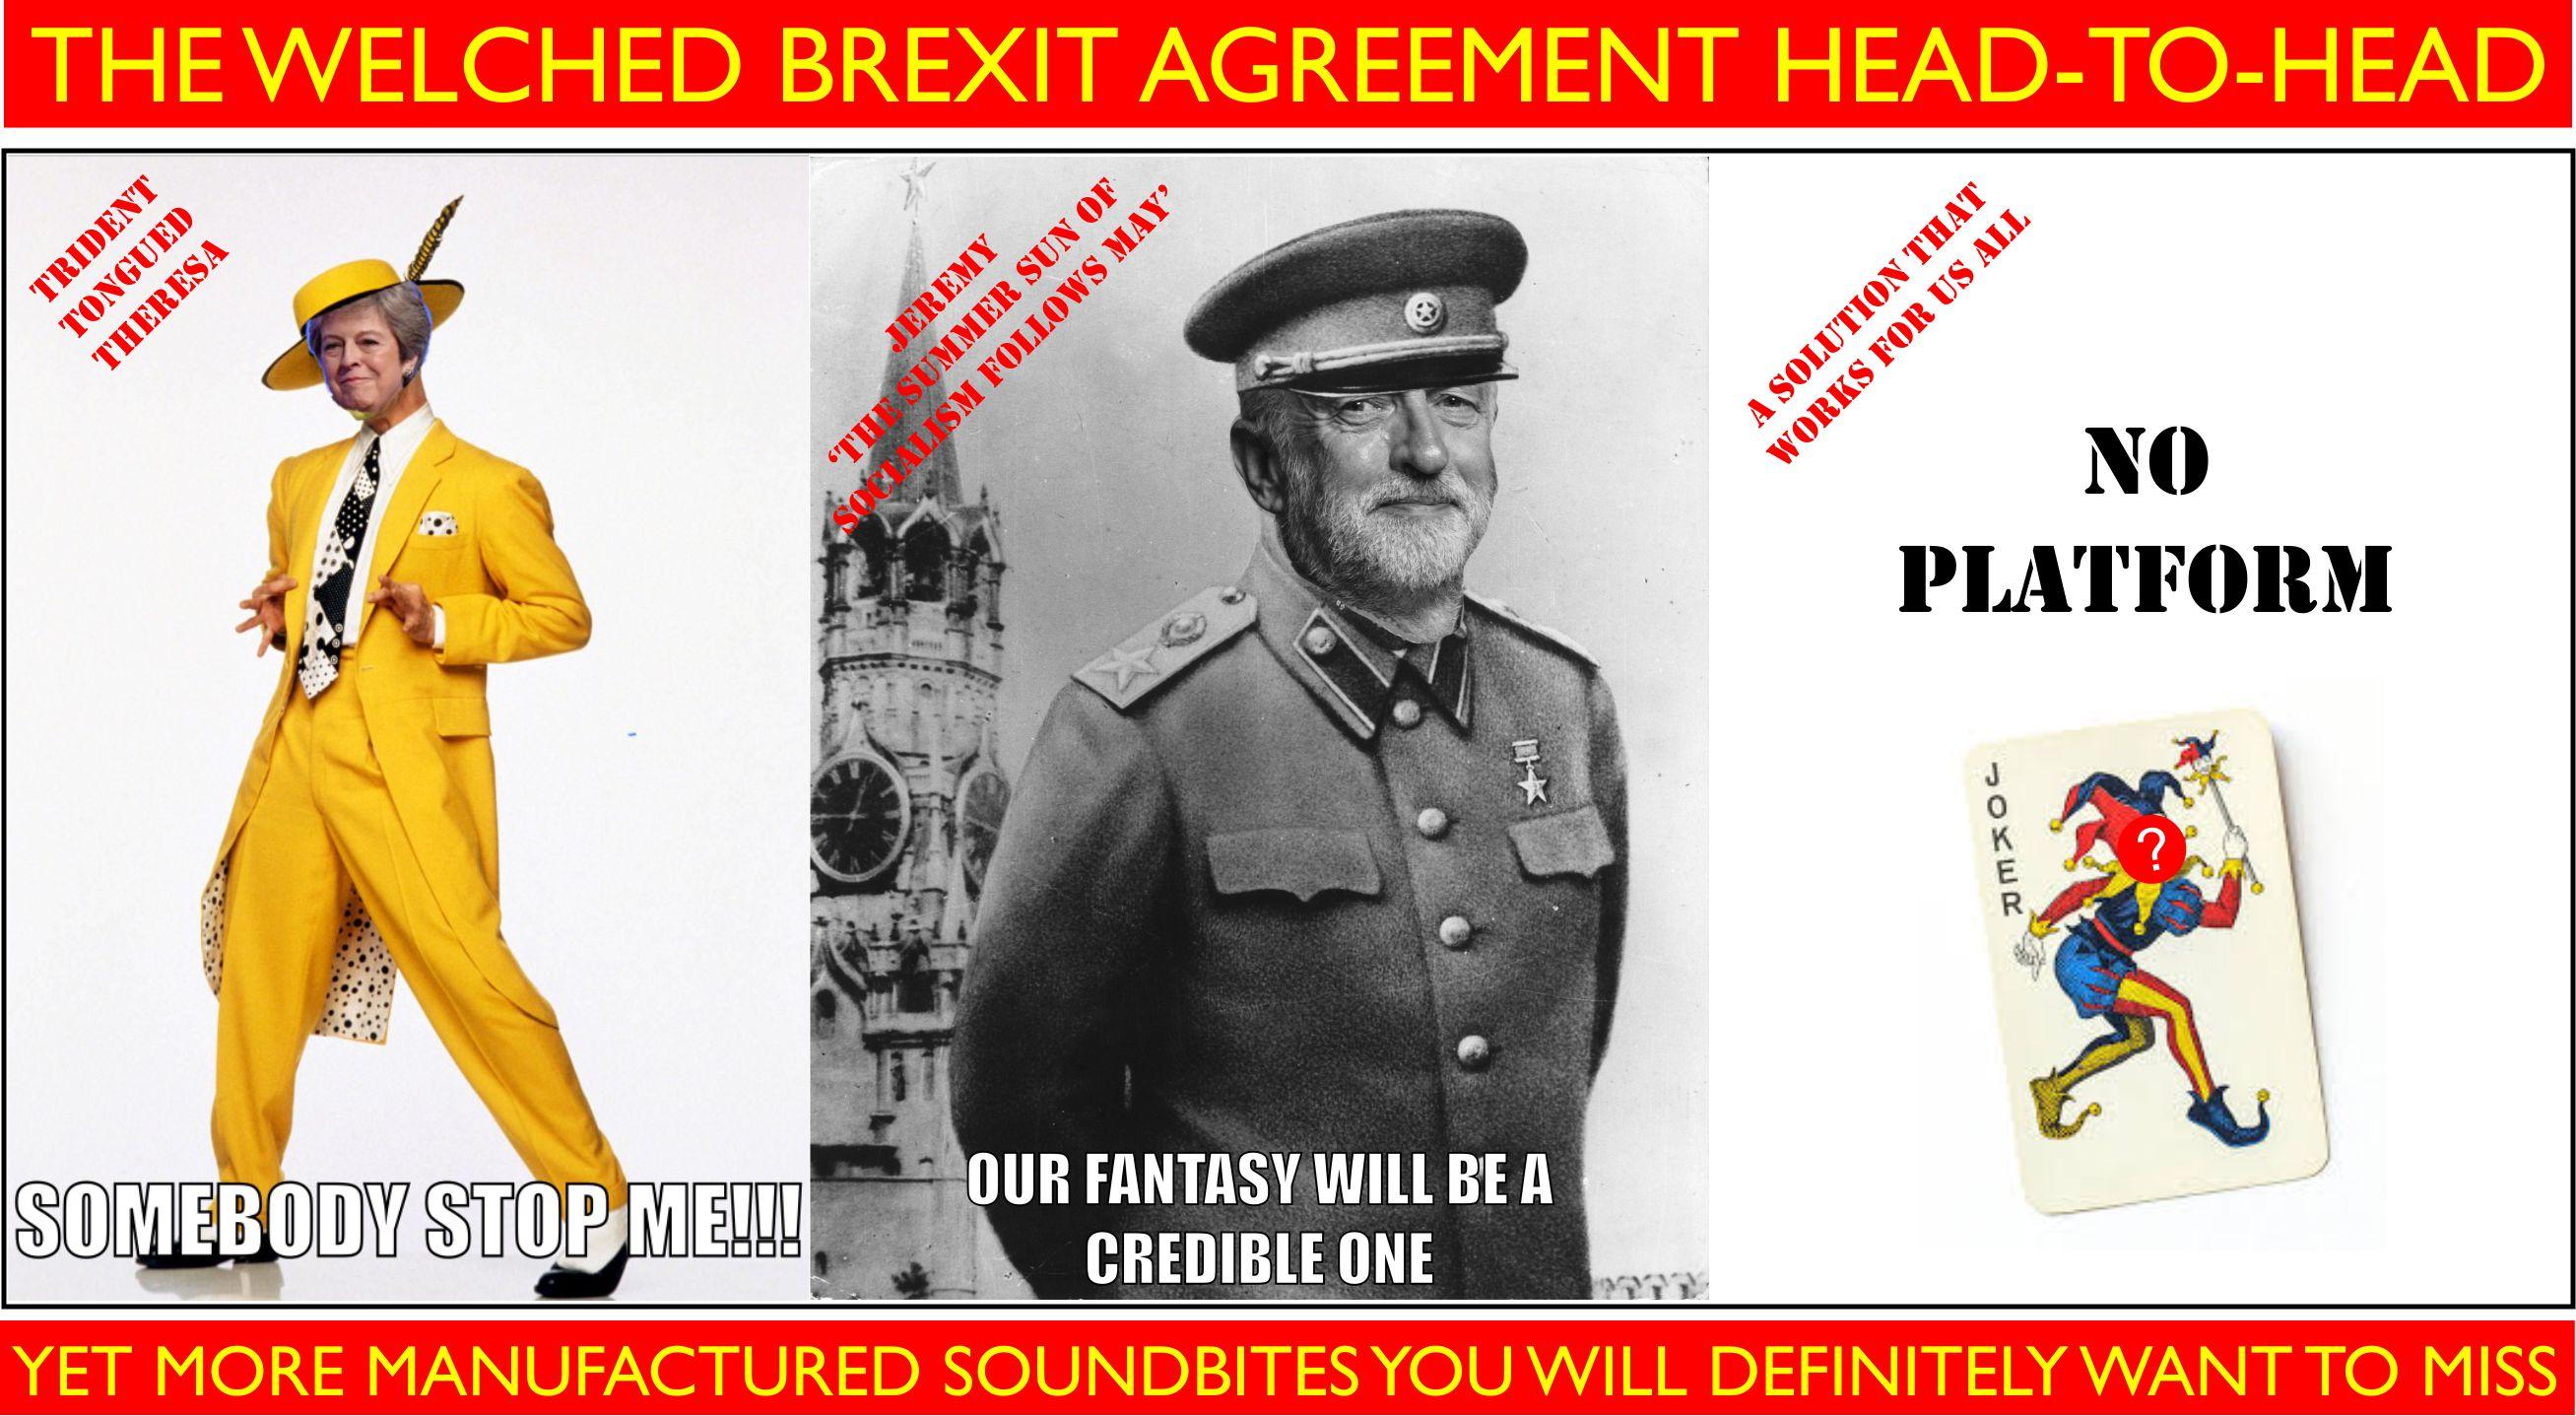 May Corbyn Debate